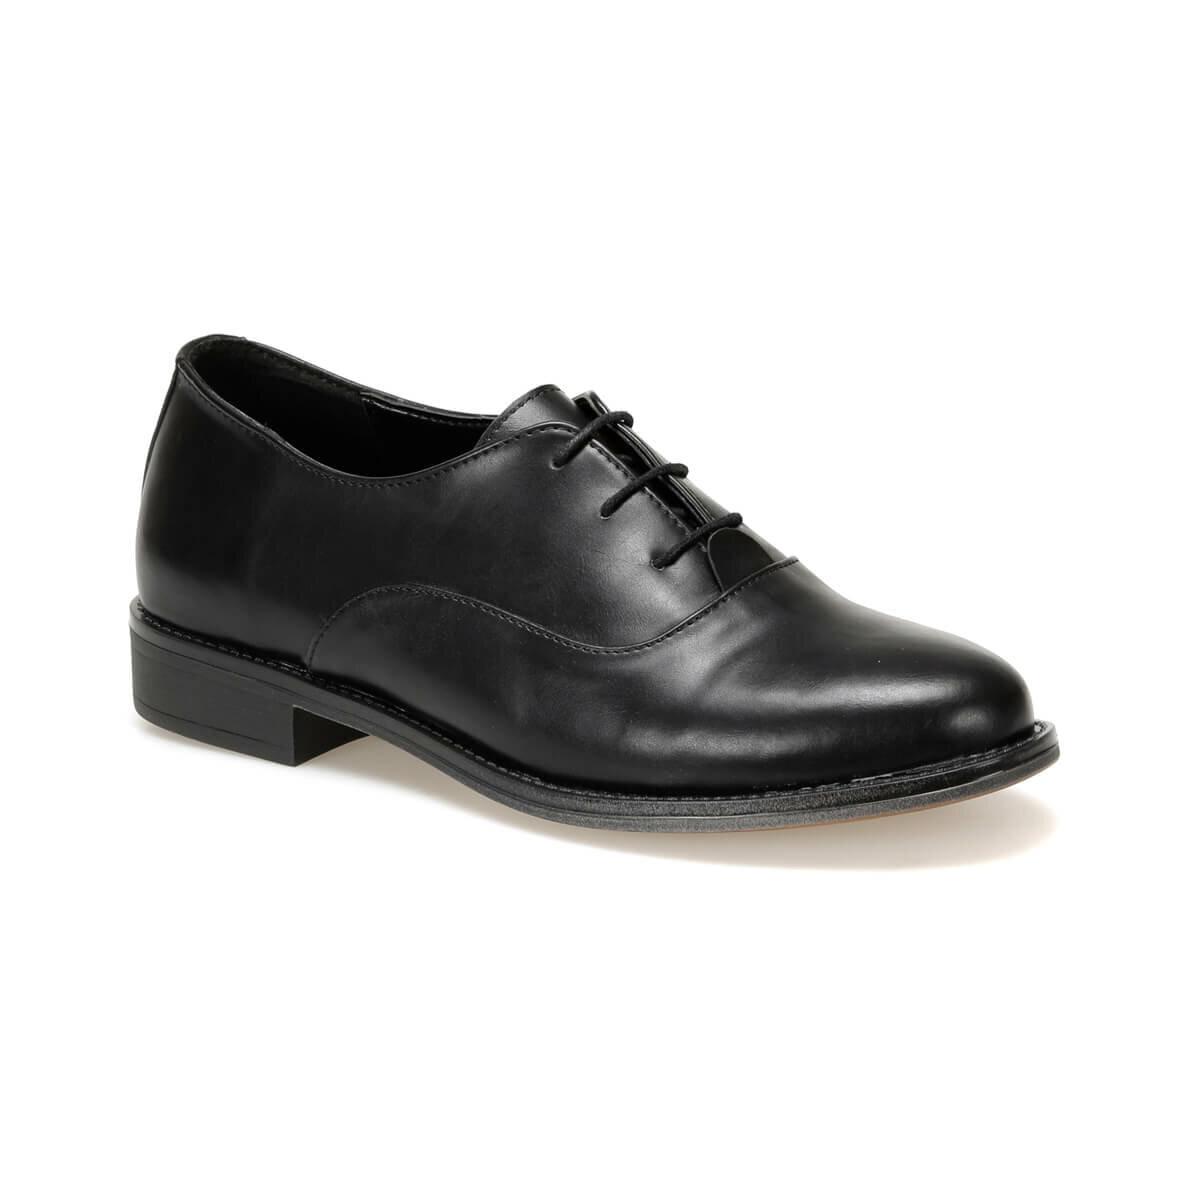 FLO DW19074 Black Women Oxford Shoes Miss F